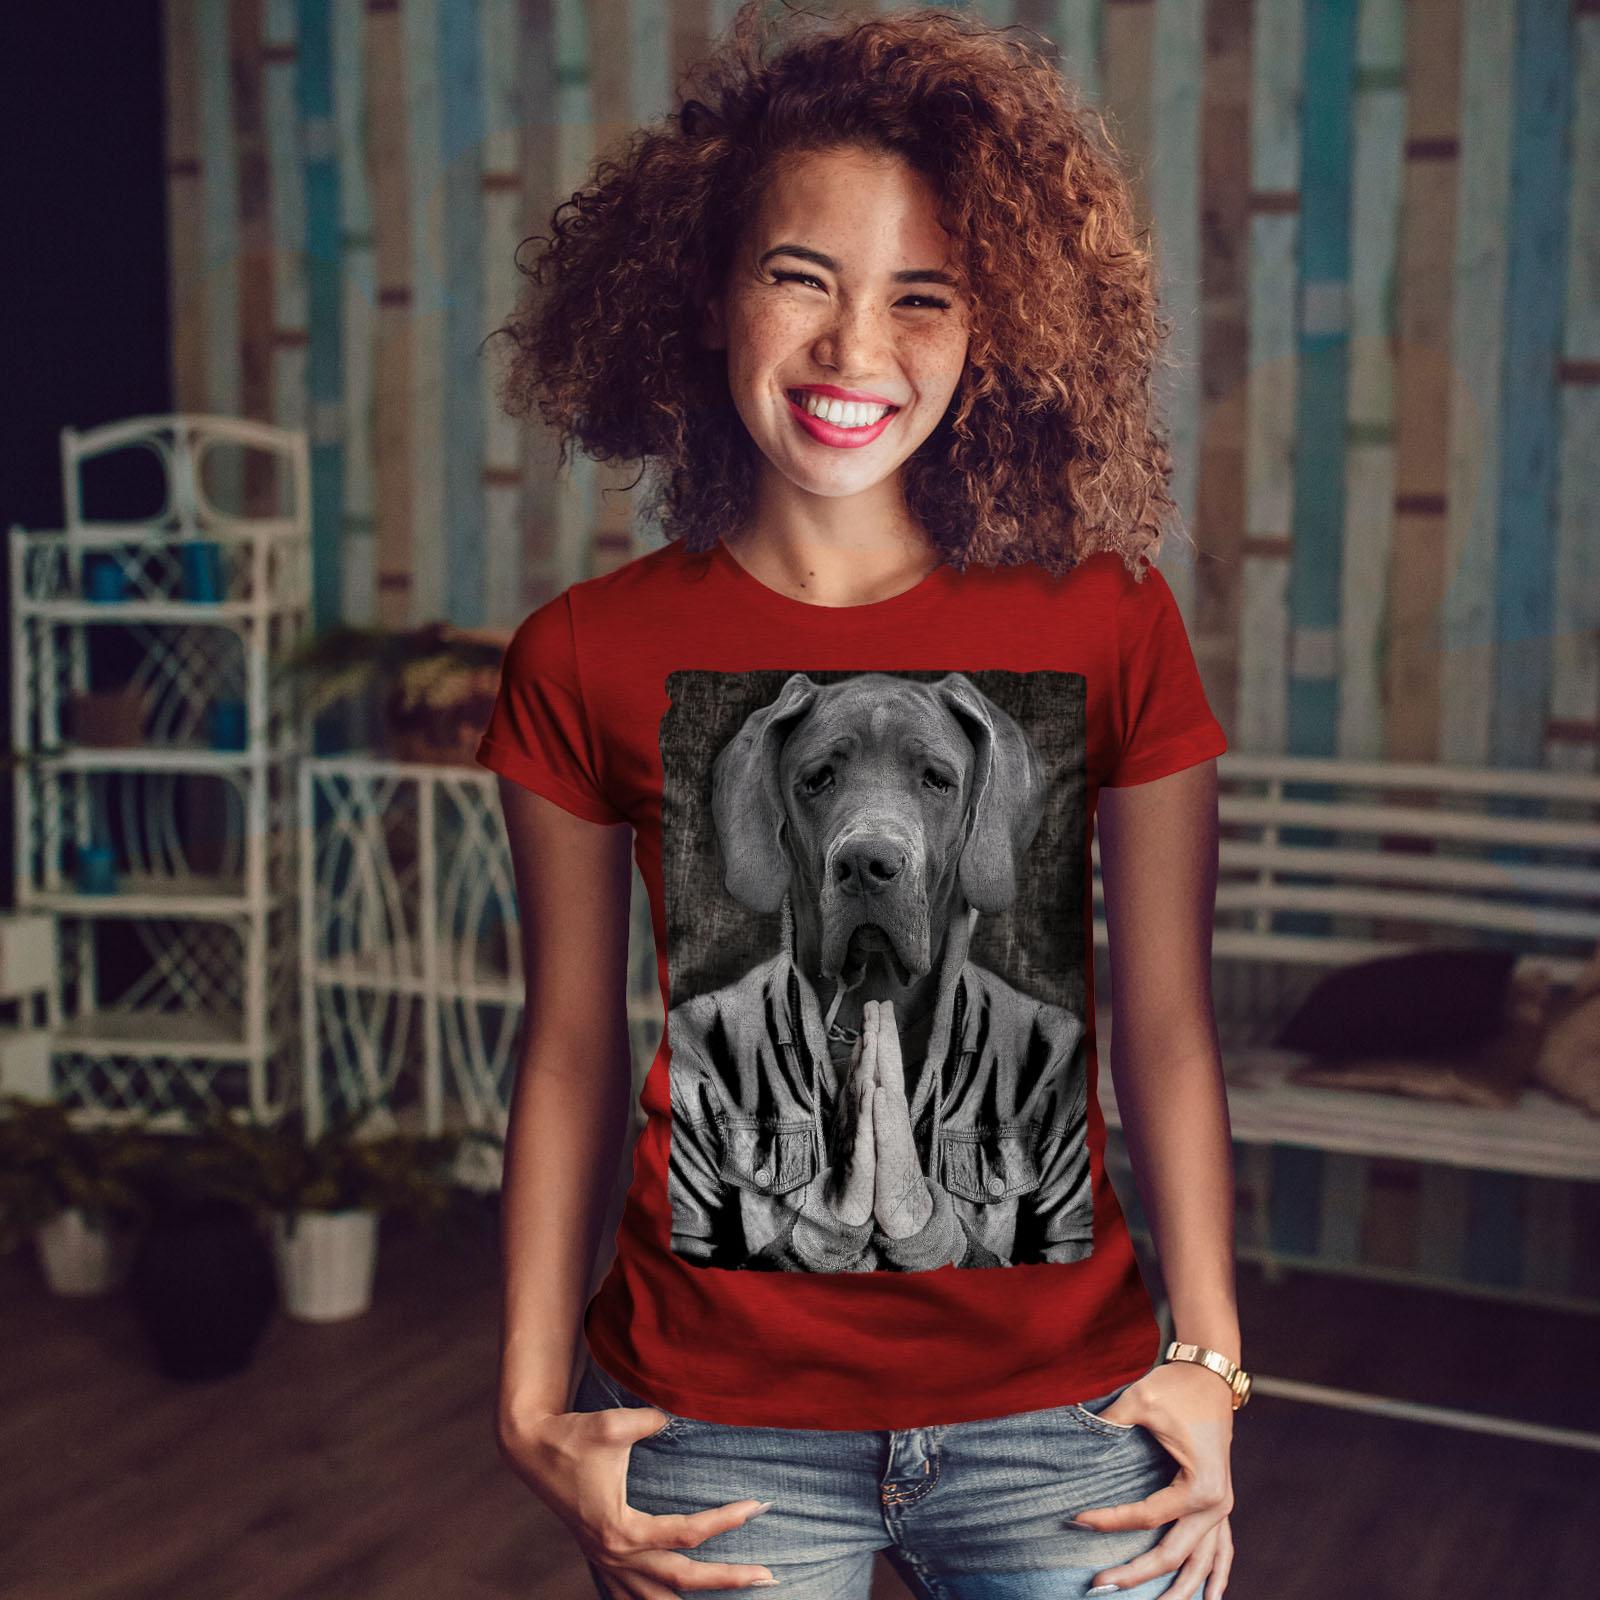 Wellcoda Great Dane face Cool Dog T-shirt femme Pet Casual Design Imprimé Tee